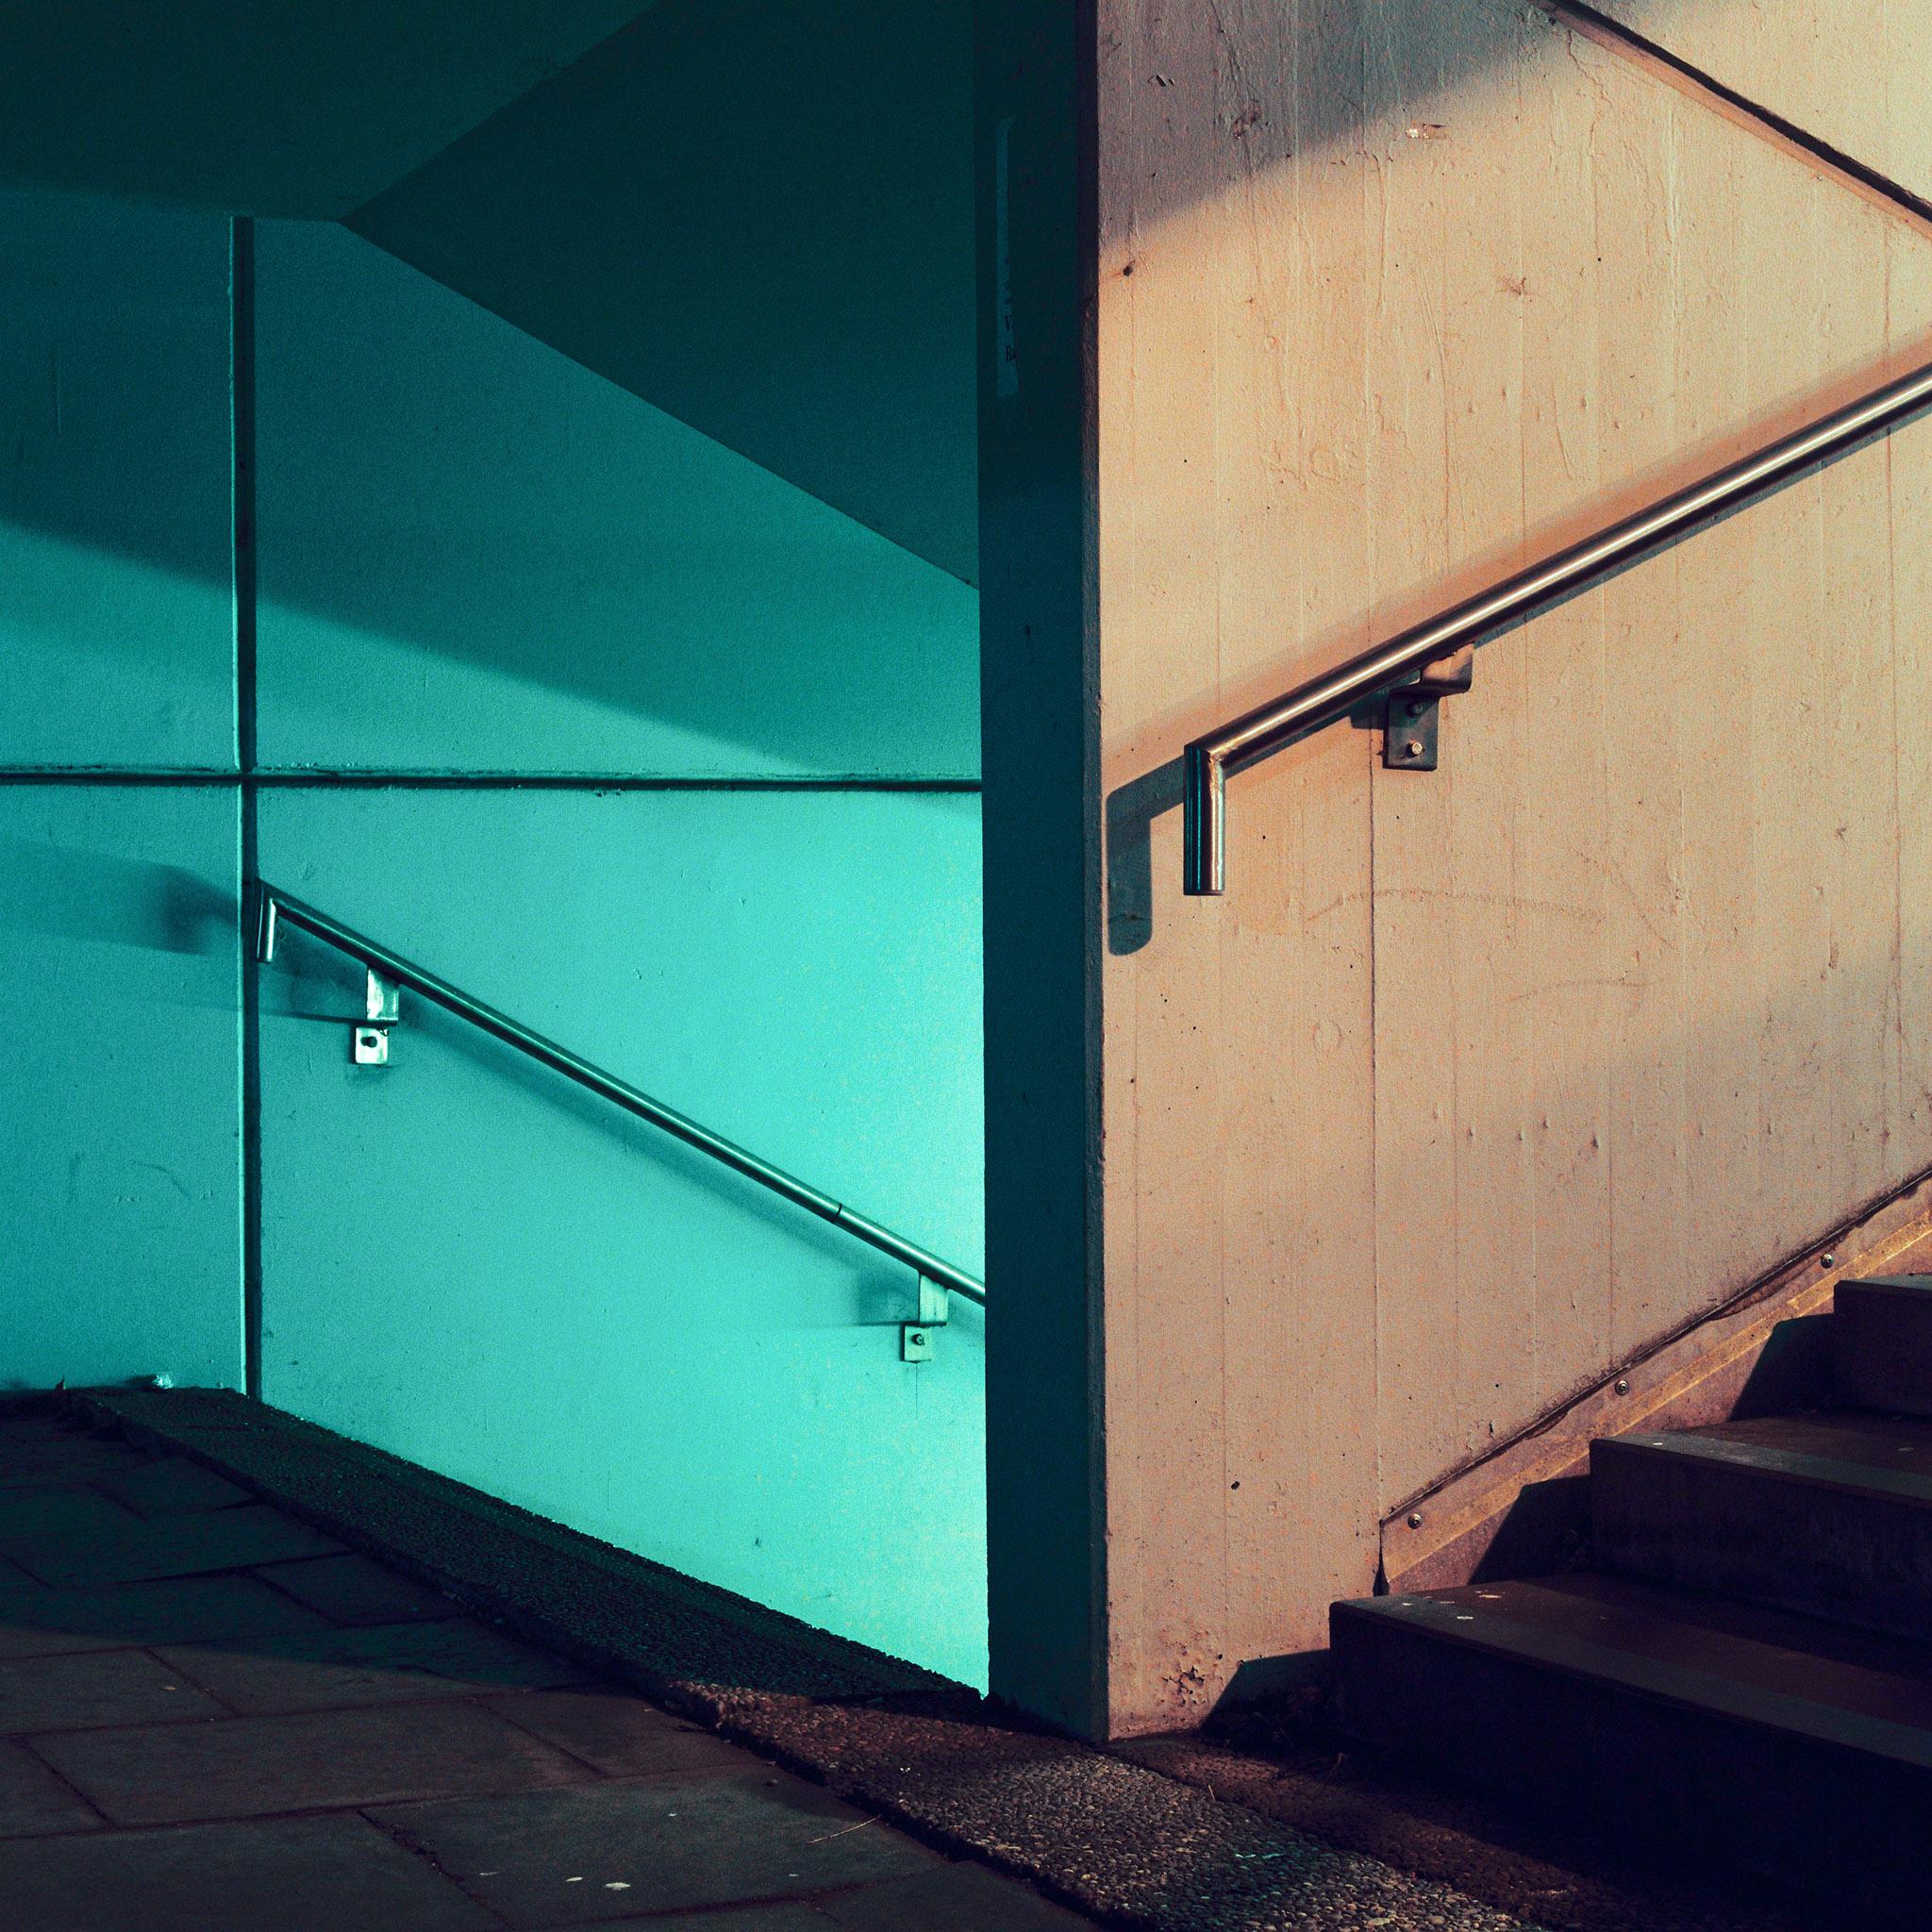 nils karlson | blue light is blue | Mamiya RZ67 | 110mm | Portra 800